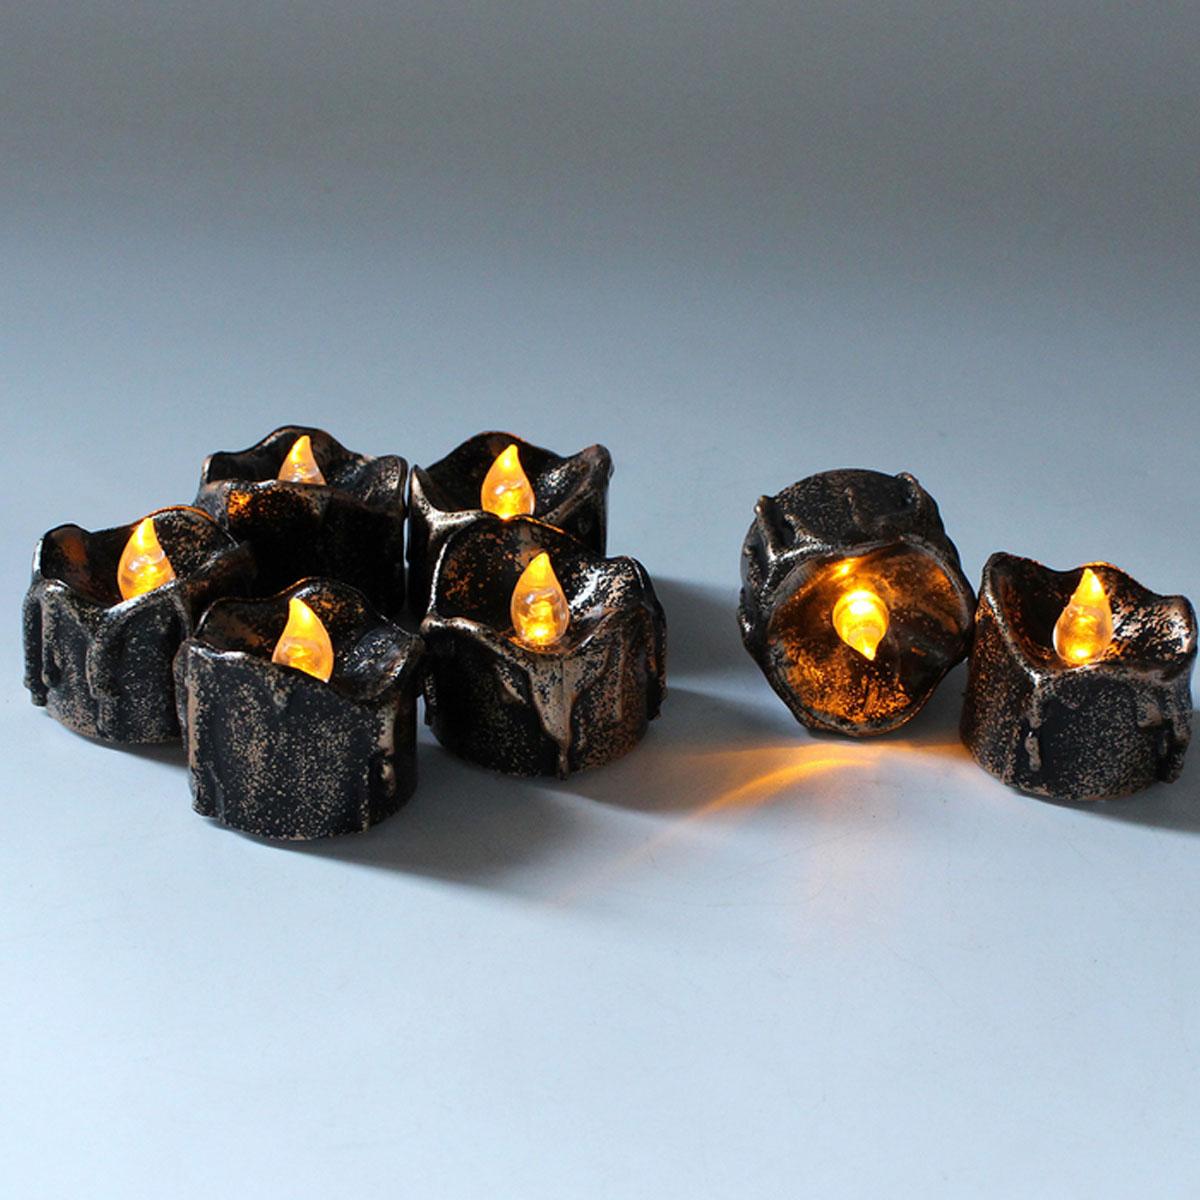 12PCS Battery Operated LED Flameless Candles Light Halloween Christmas Decorative Tea Lamps